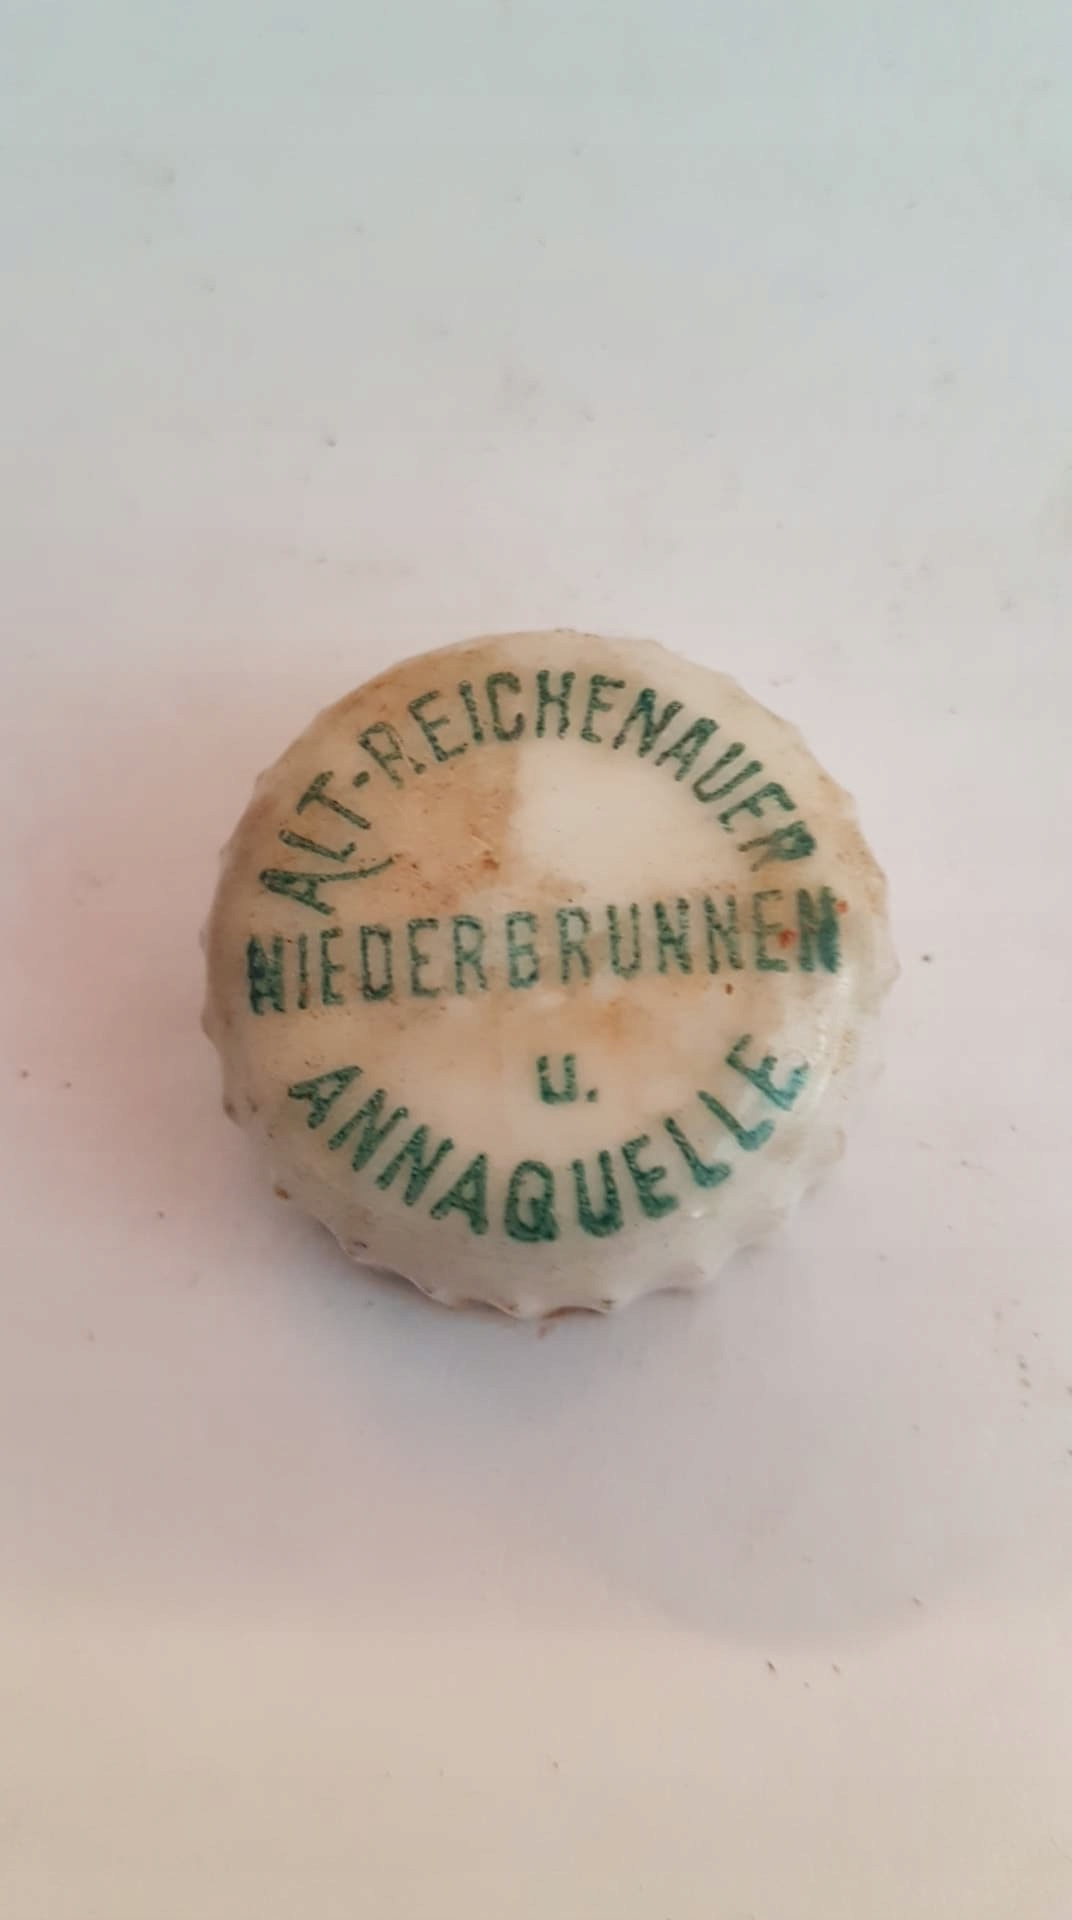 Porcelanka Niederbrunnen